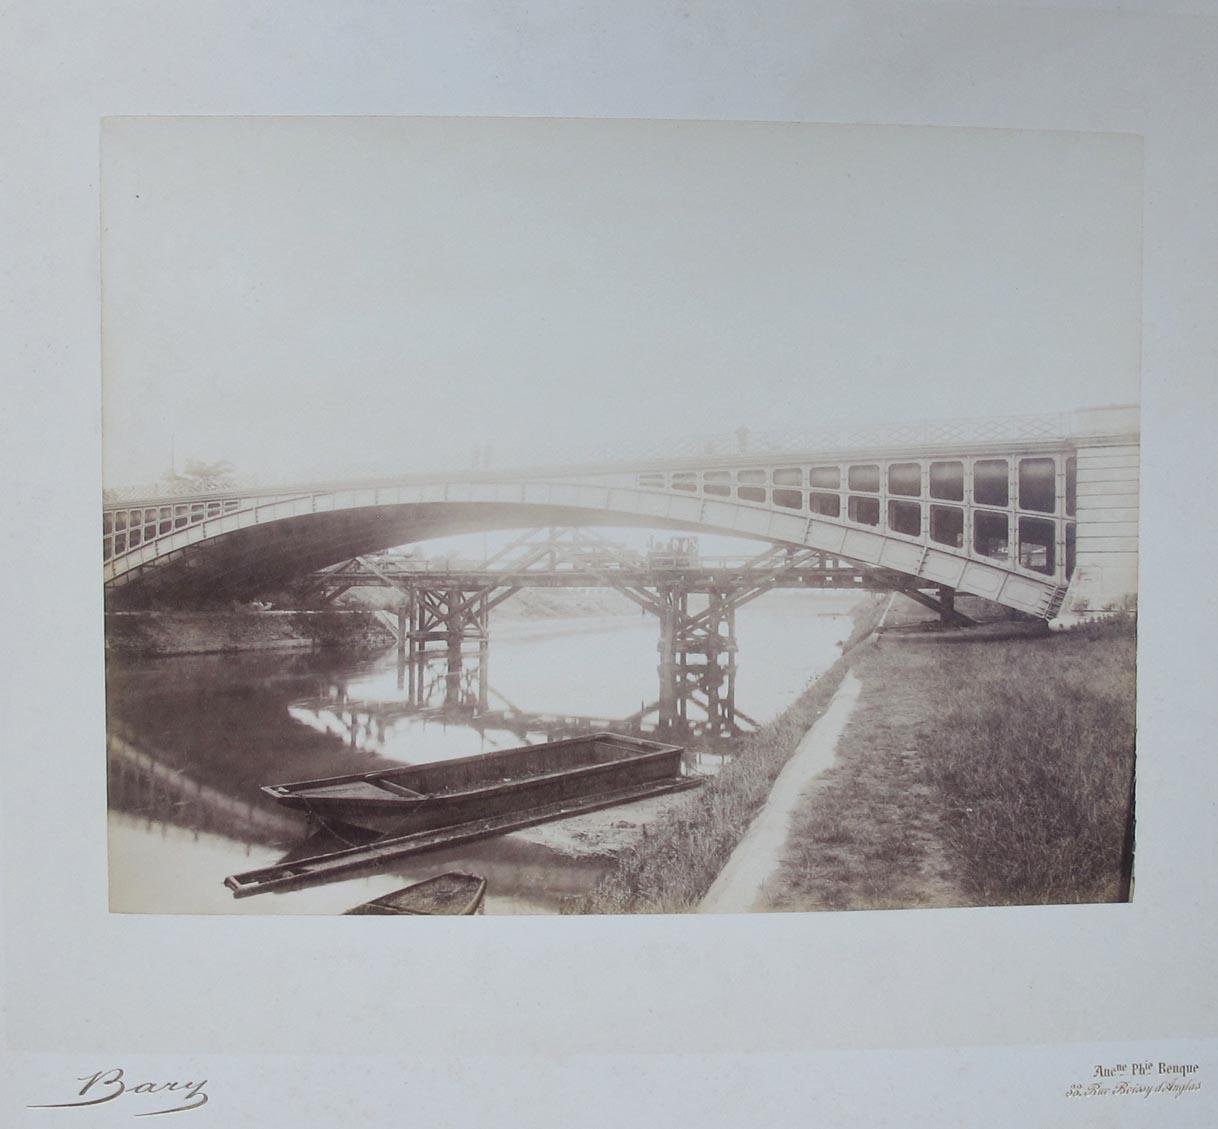 BENQUE & CIE. - Bridge, Bary, the construction of the Parisian Metropolitan during 1899-1911.